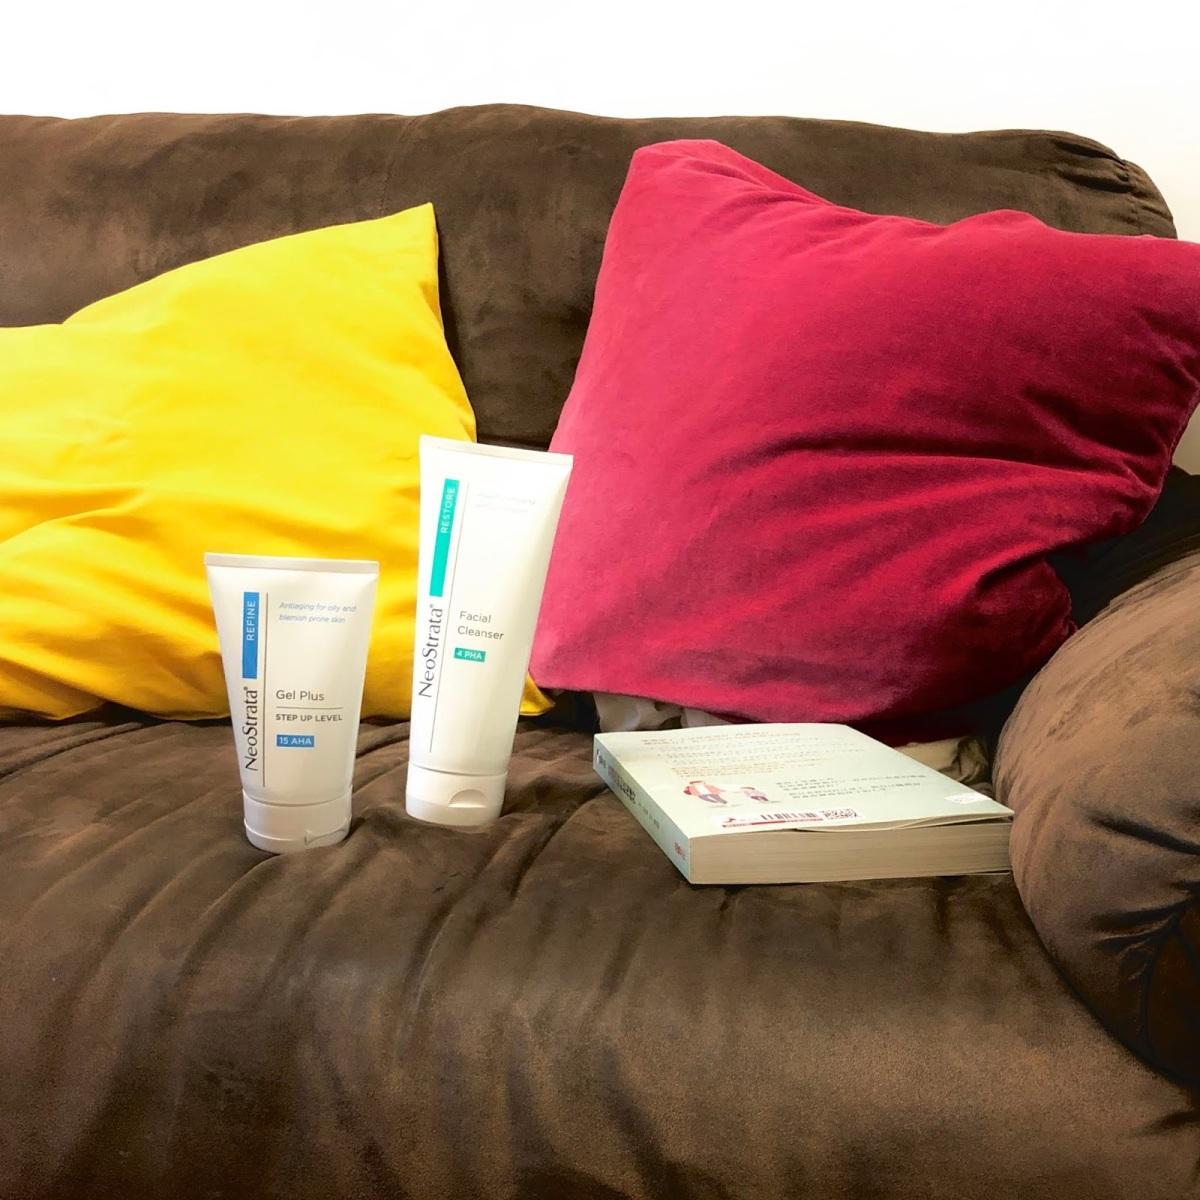 [SKIN] 重生的第一步︰為肌膚更生 (NeoStrata Gel Plus 更生活膚啫喱面膜及溫和潔面啫喱)